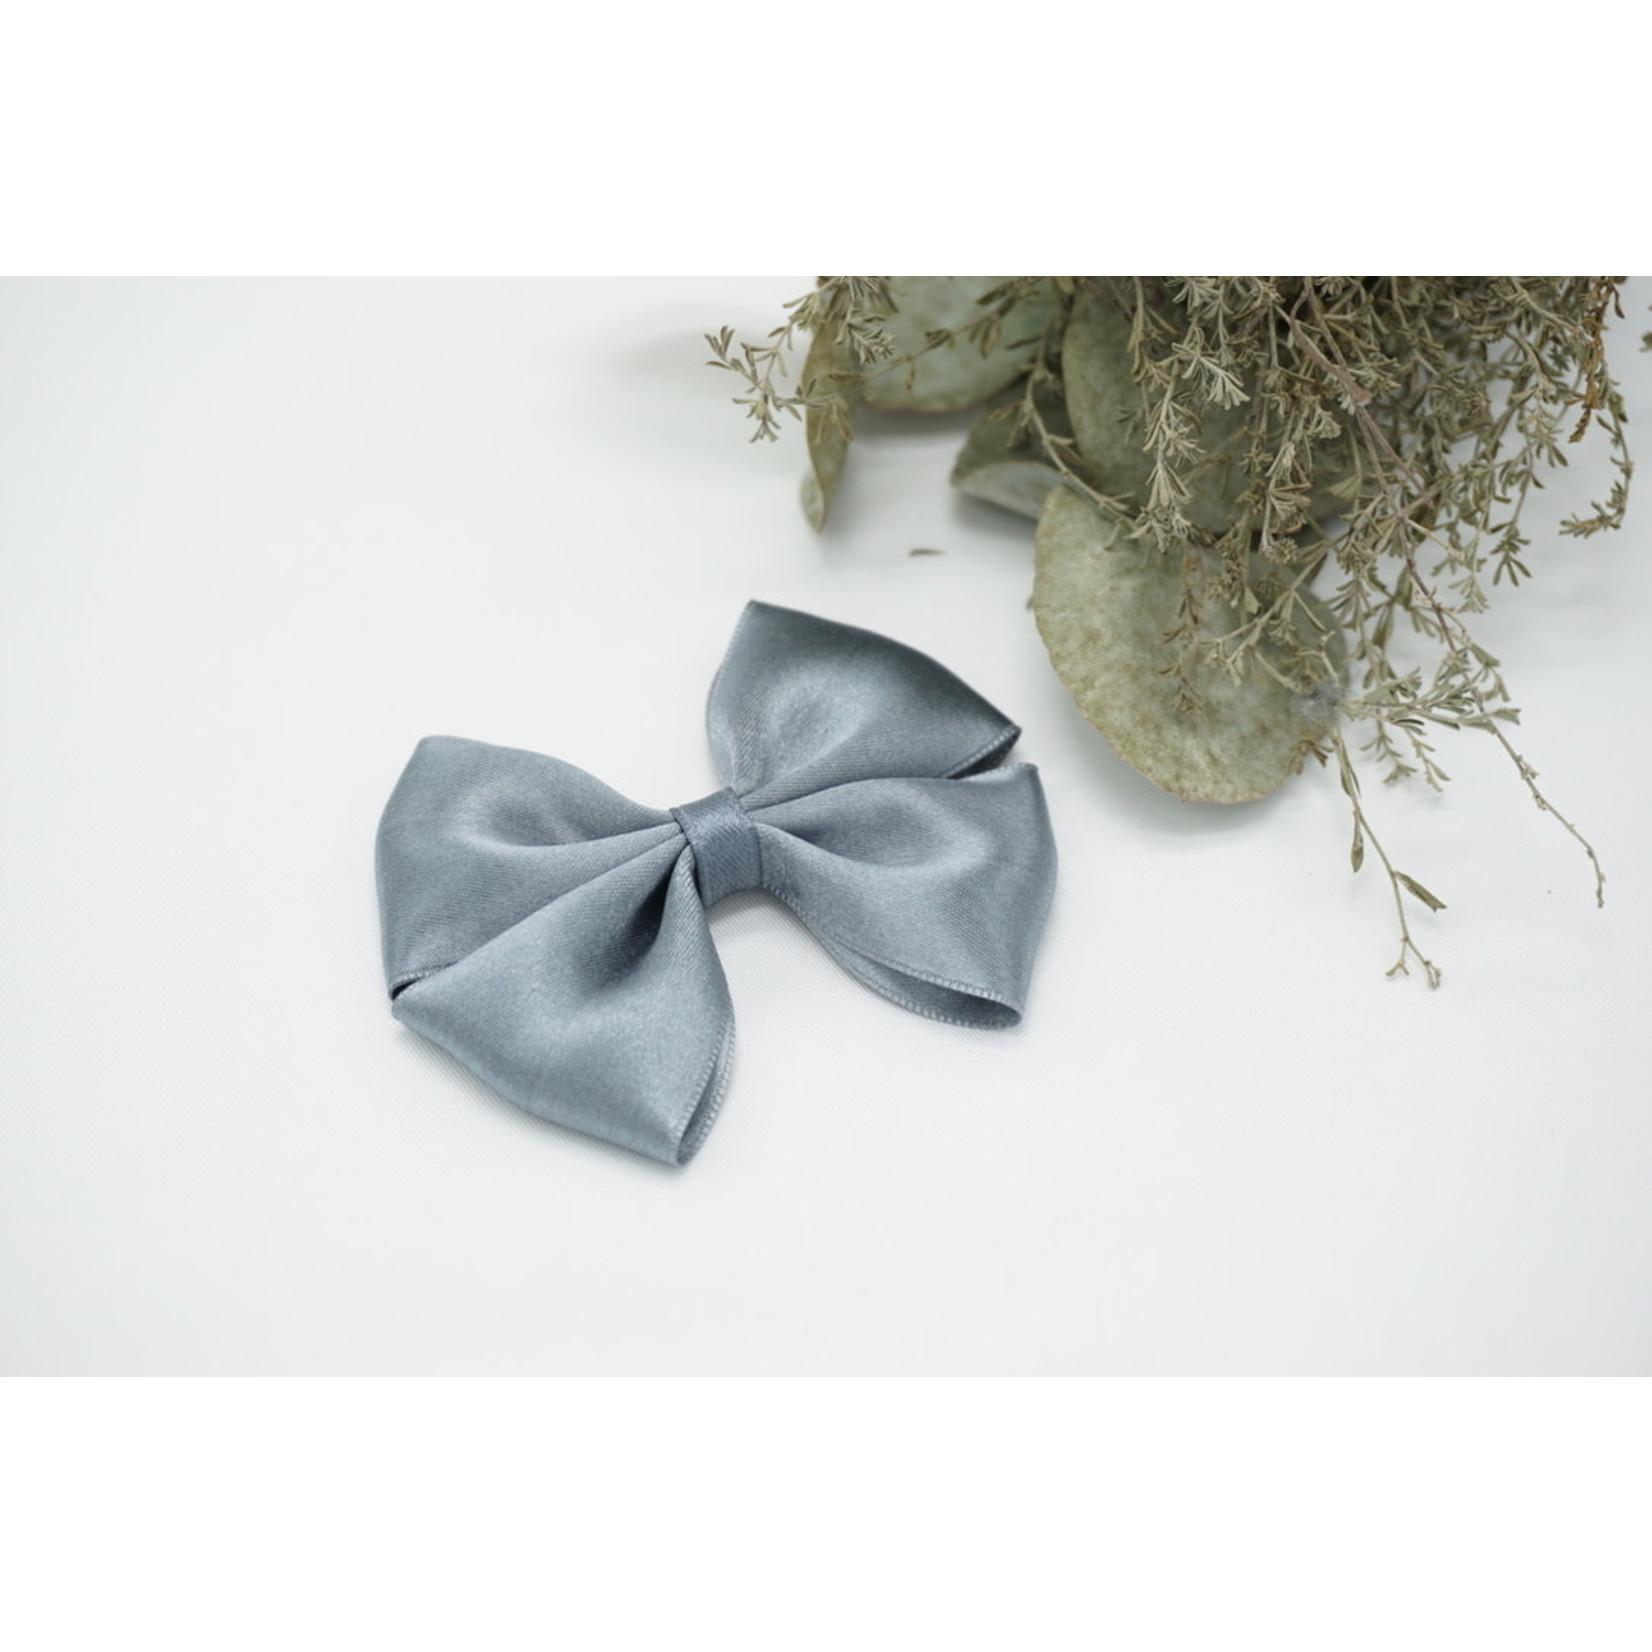 Petite Zara Satin Bow - Grey